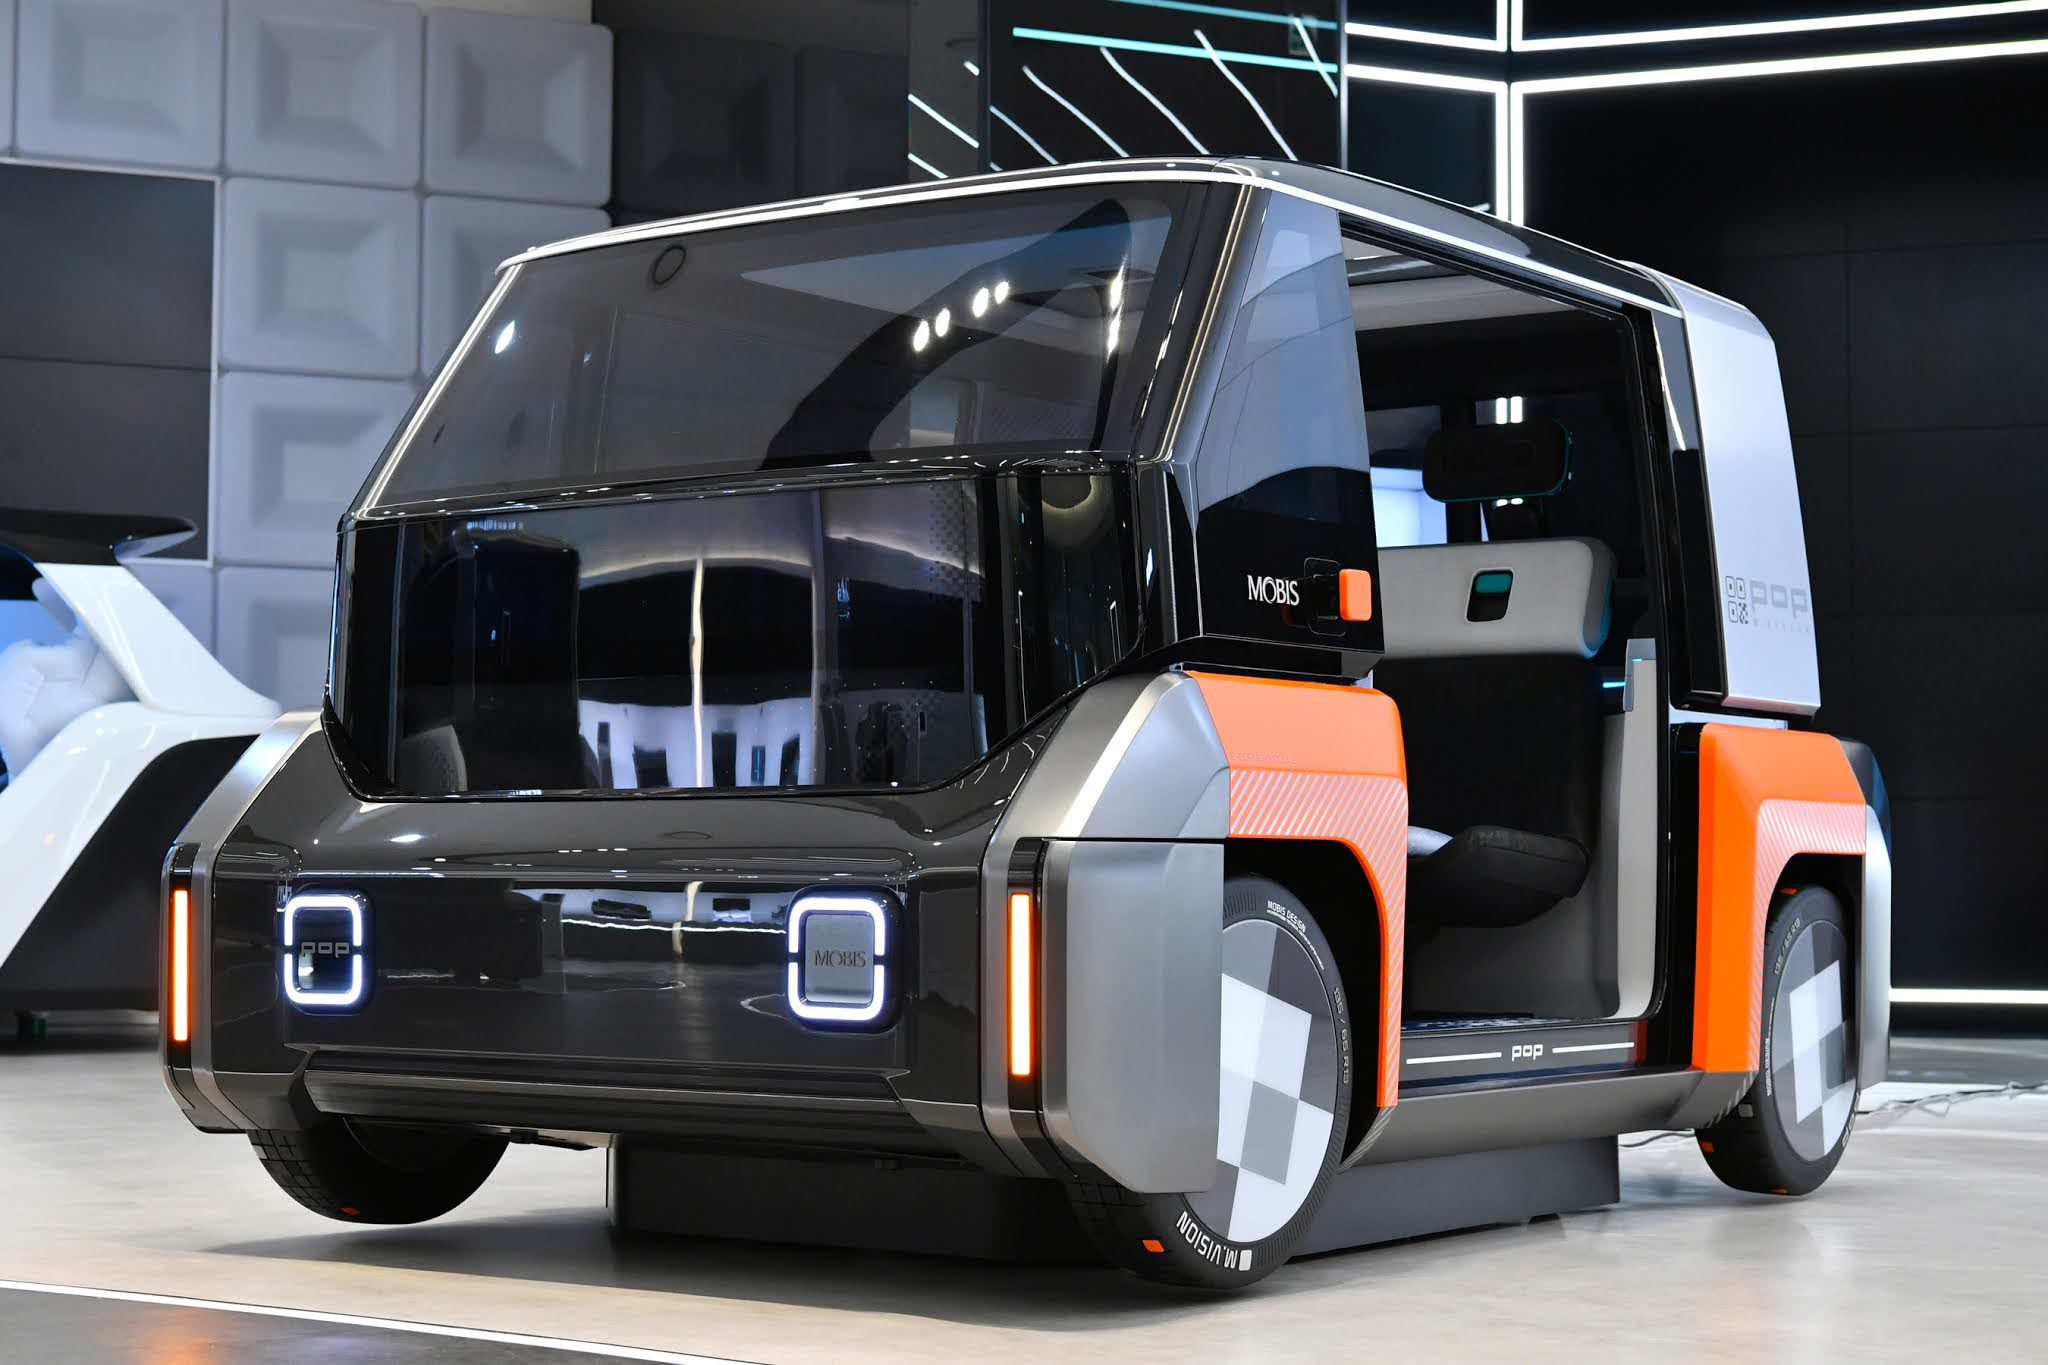 Hyundai Mobis, announced the urban shared future mobility concept, M.Vision X and M.Vision POP!